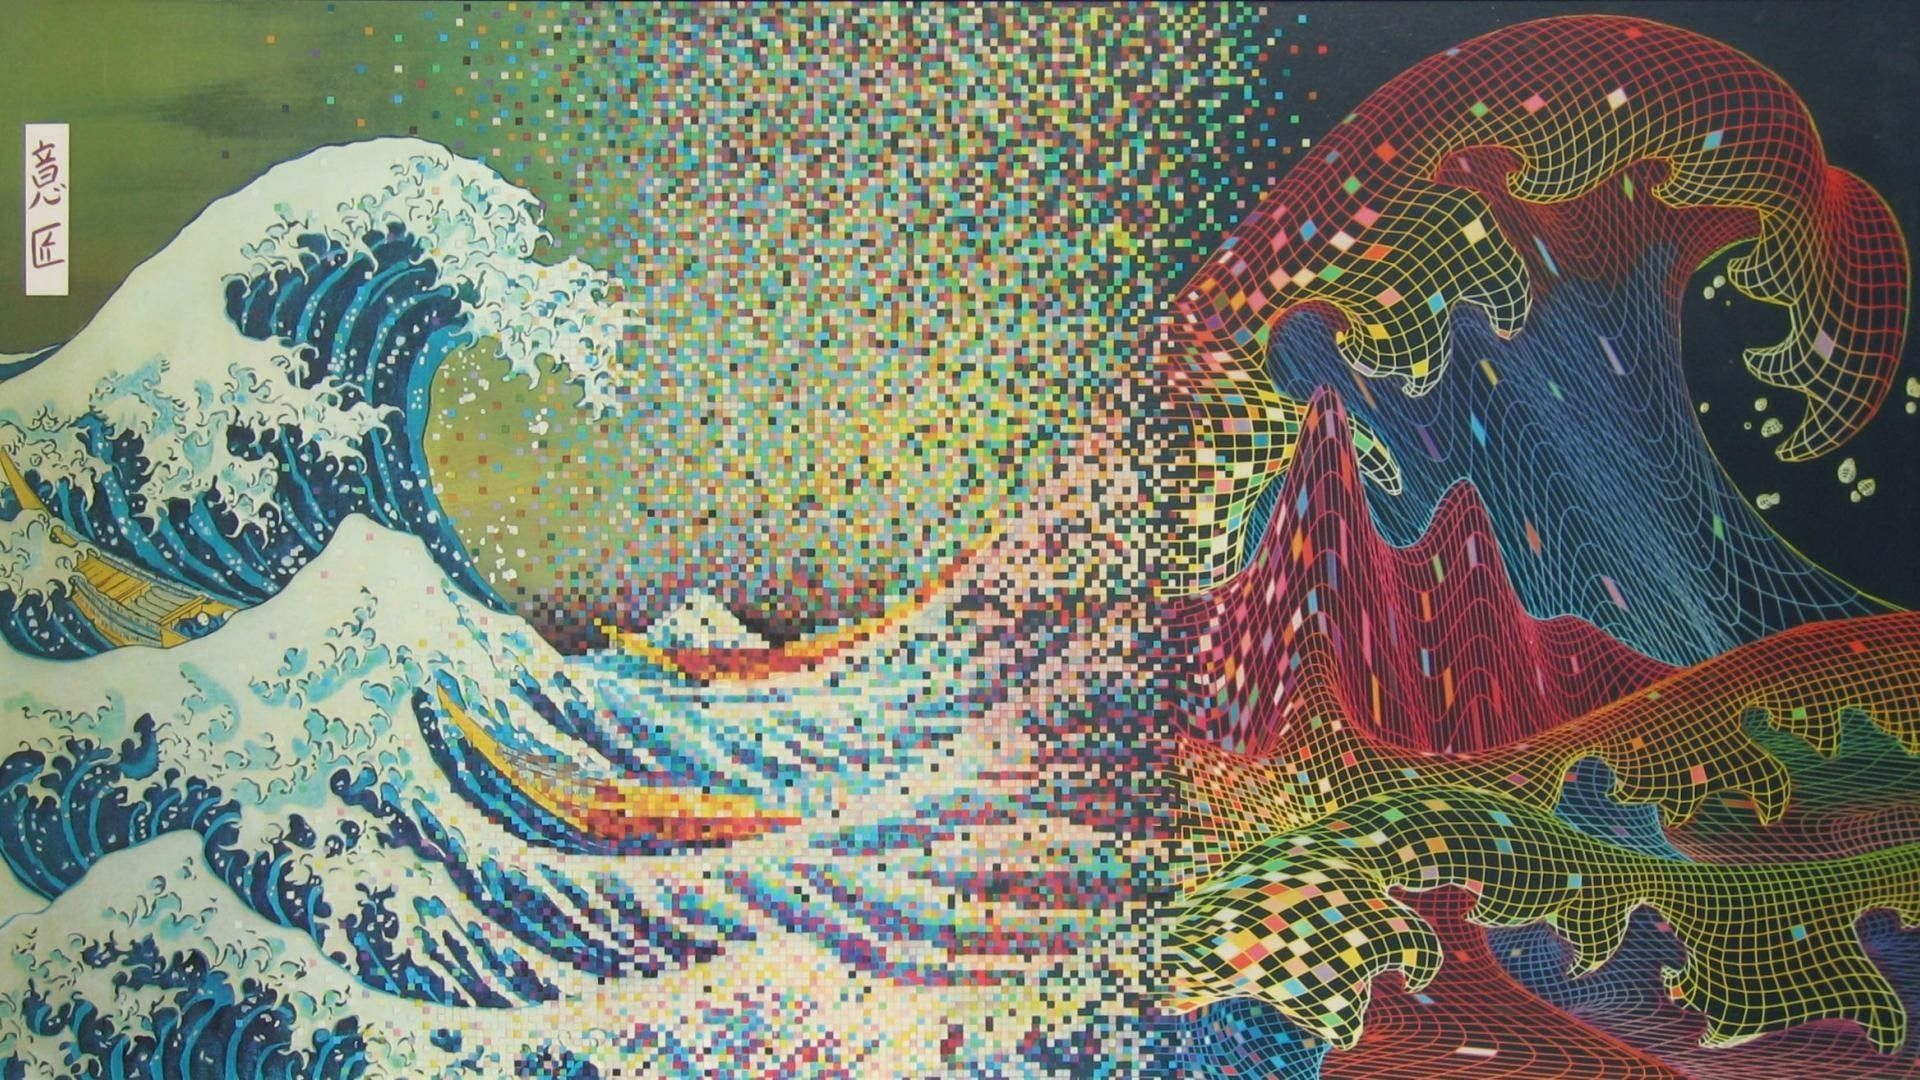 1920x1080 Trippy wallpaper Hippie wallpaper, Abstract